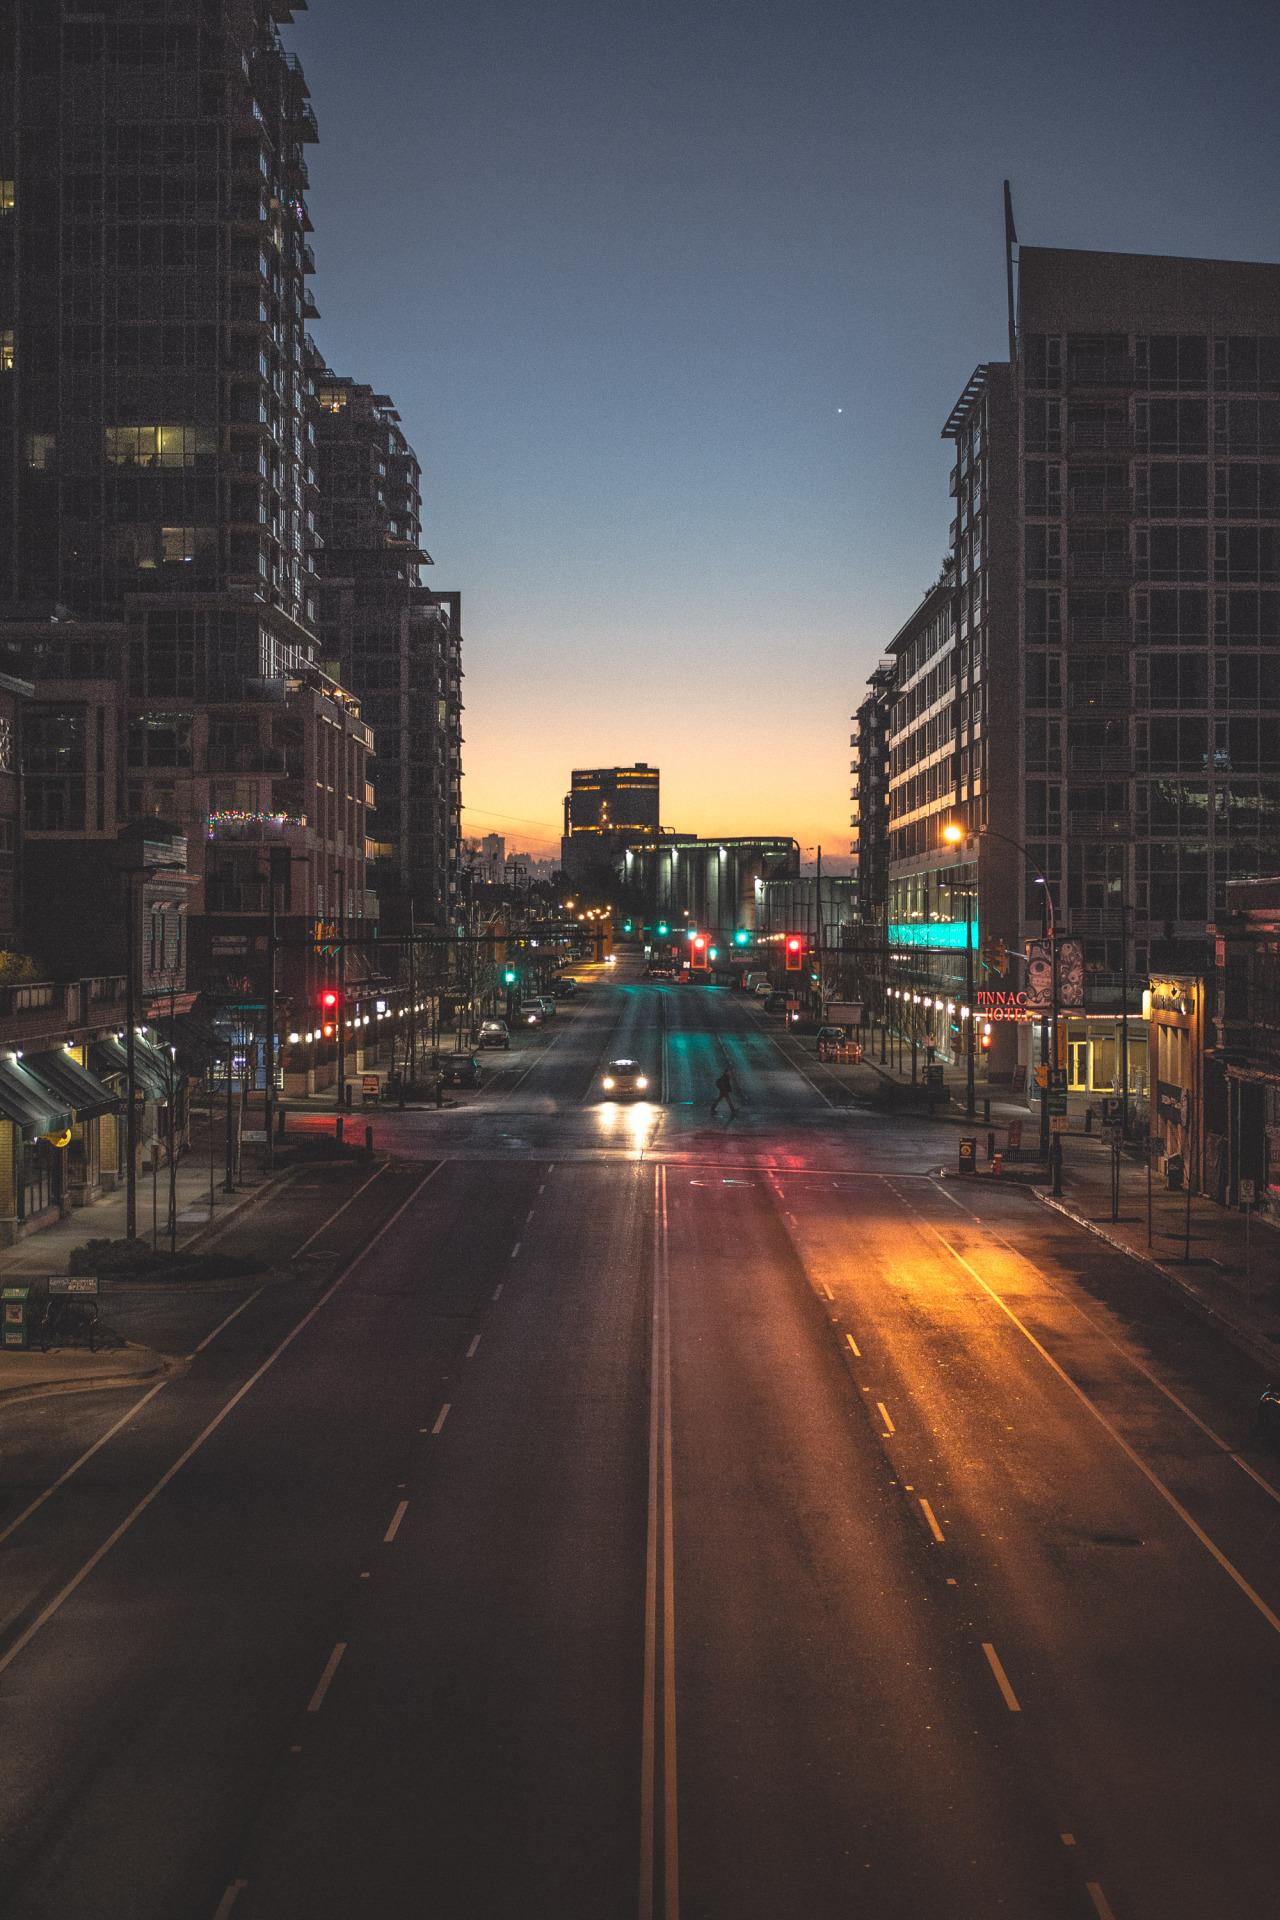 city night traffic road car 1280x1920